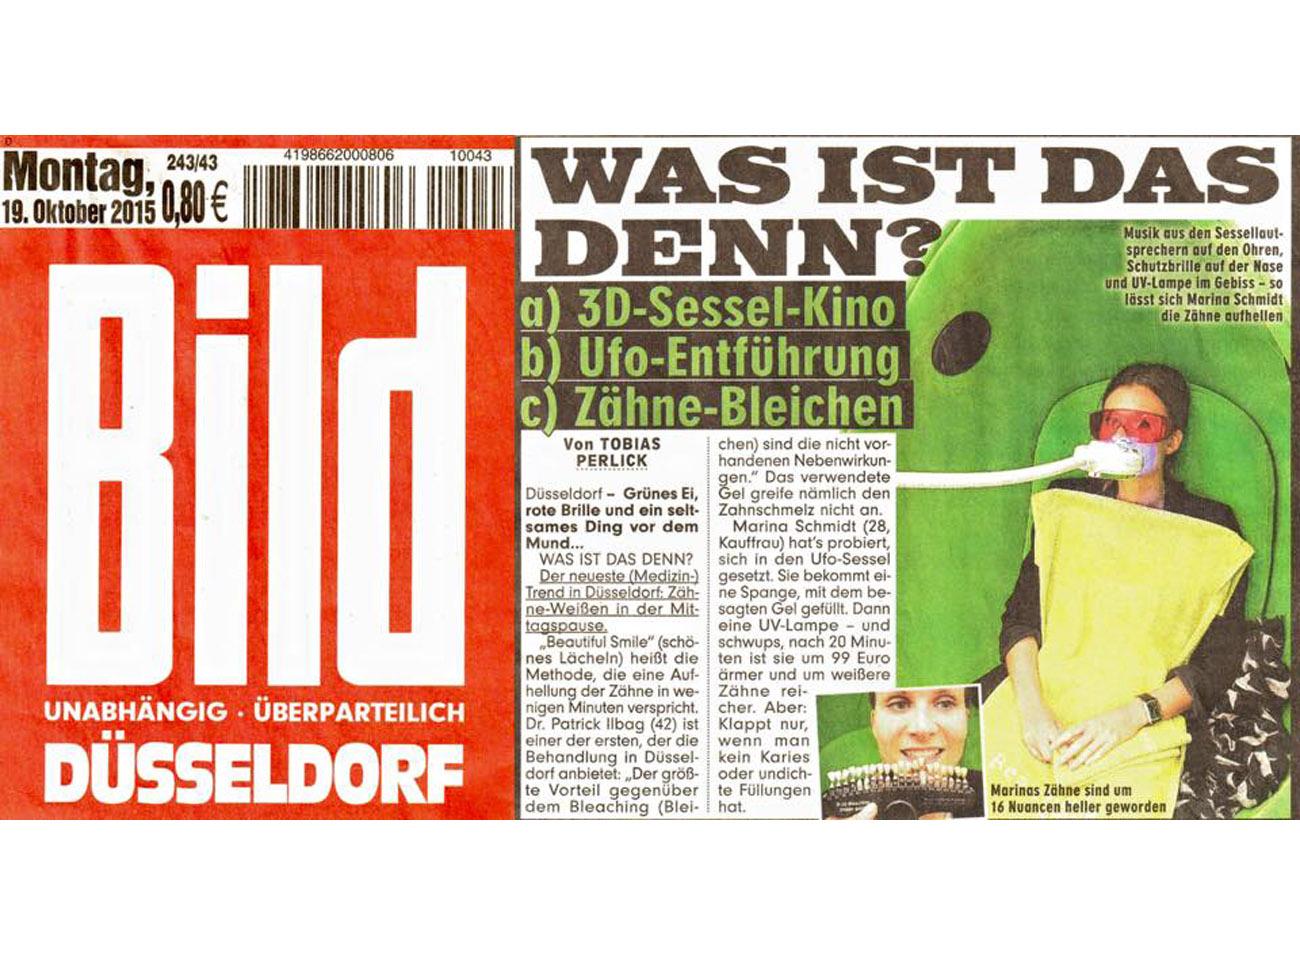 Presse Artikel Bild Düsseldorf 19.10.2015